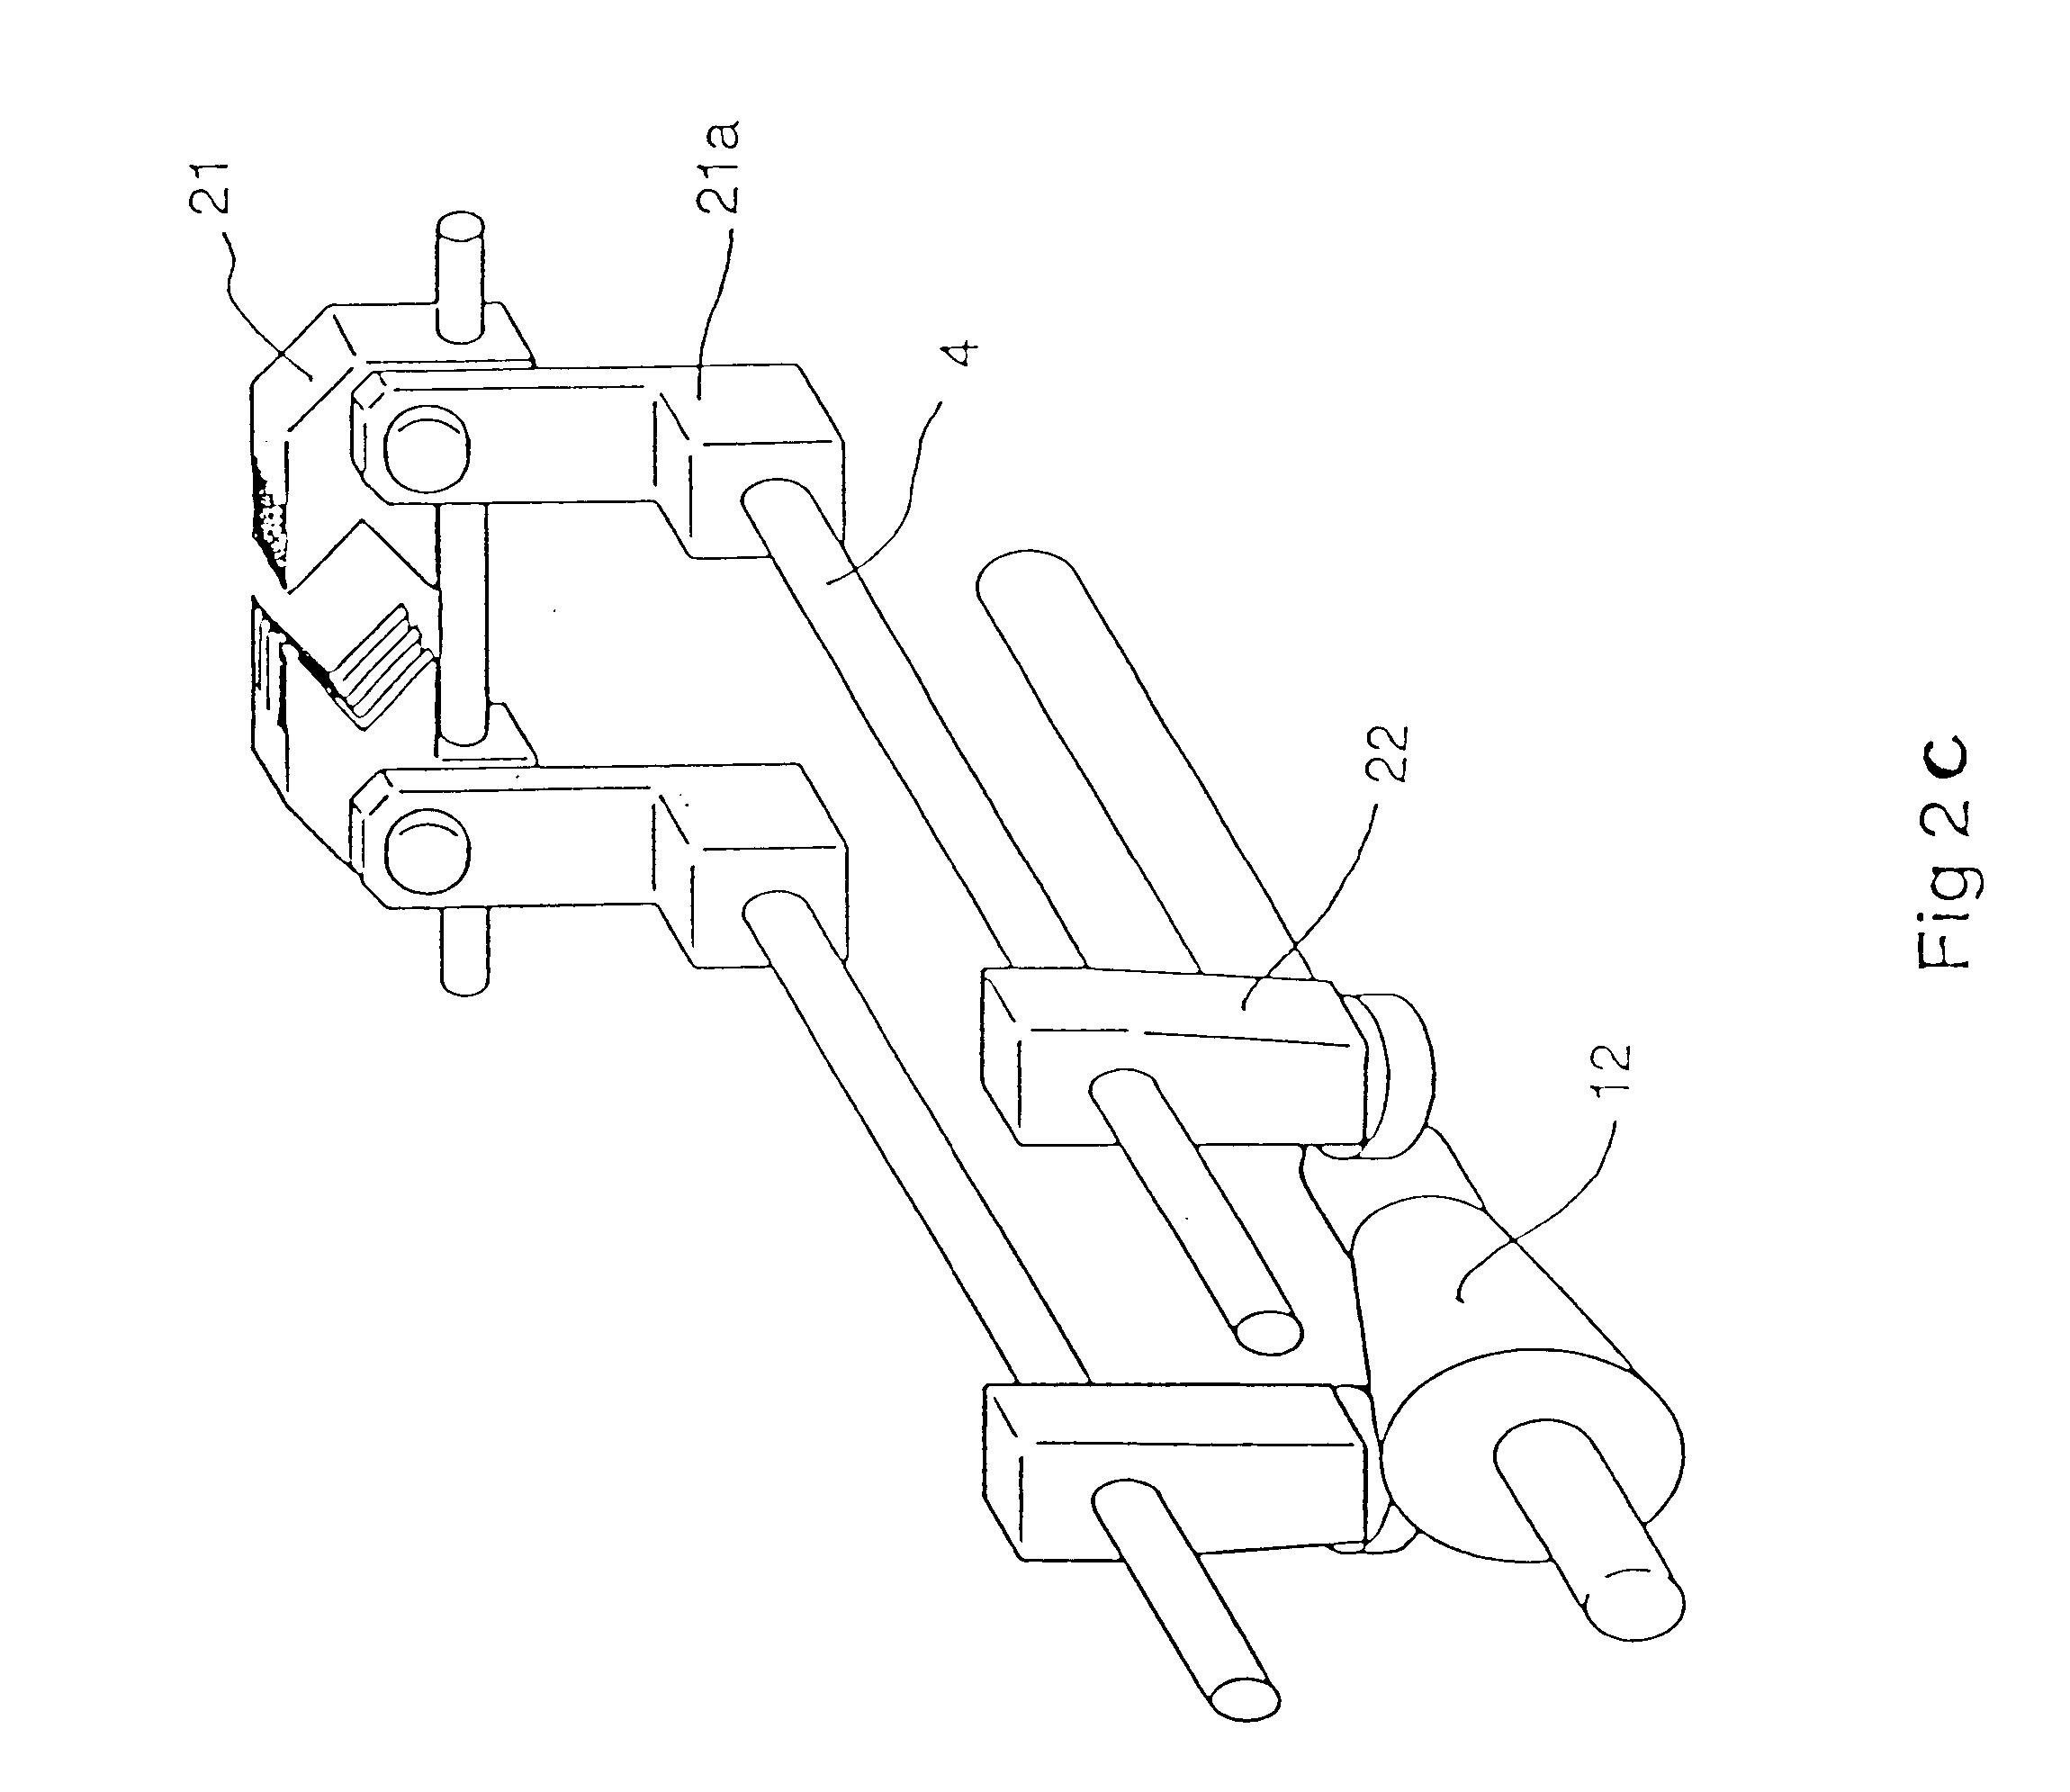 Patent Us6736032 - Wire Stripper